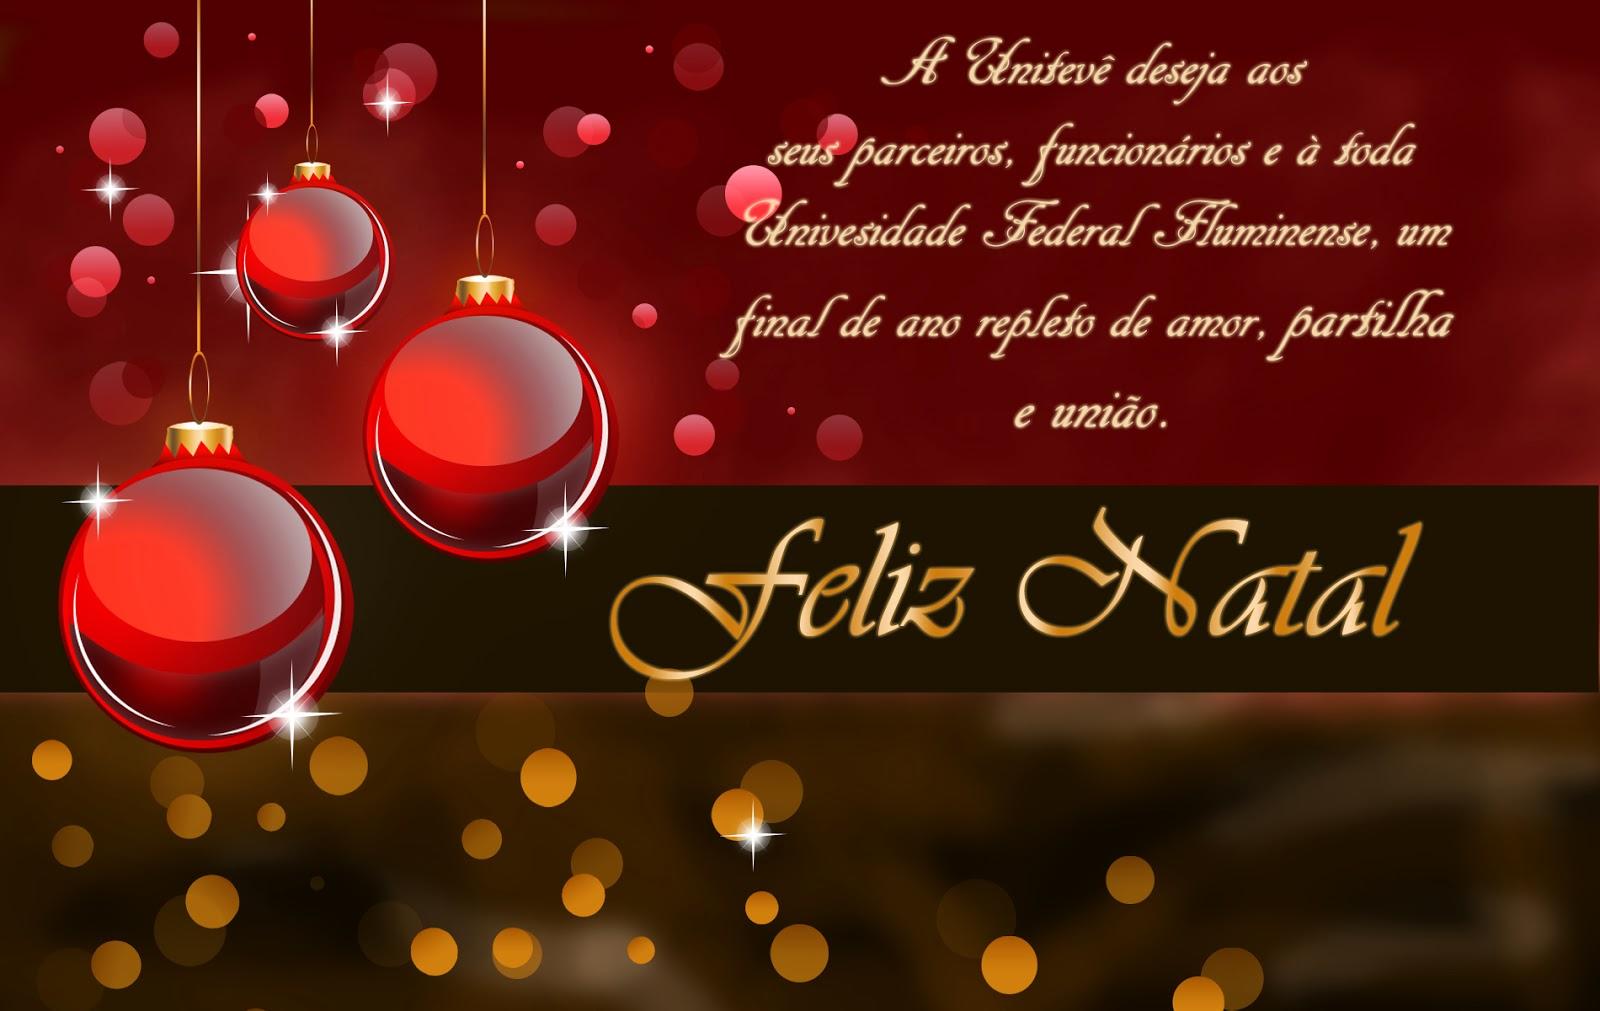 Frases Bonitas De Natal E Ano Novo